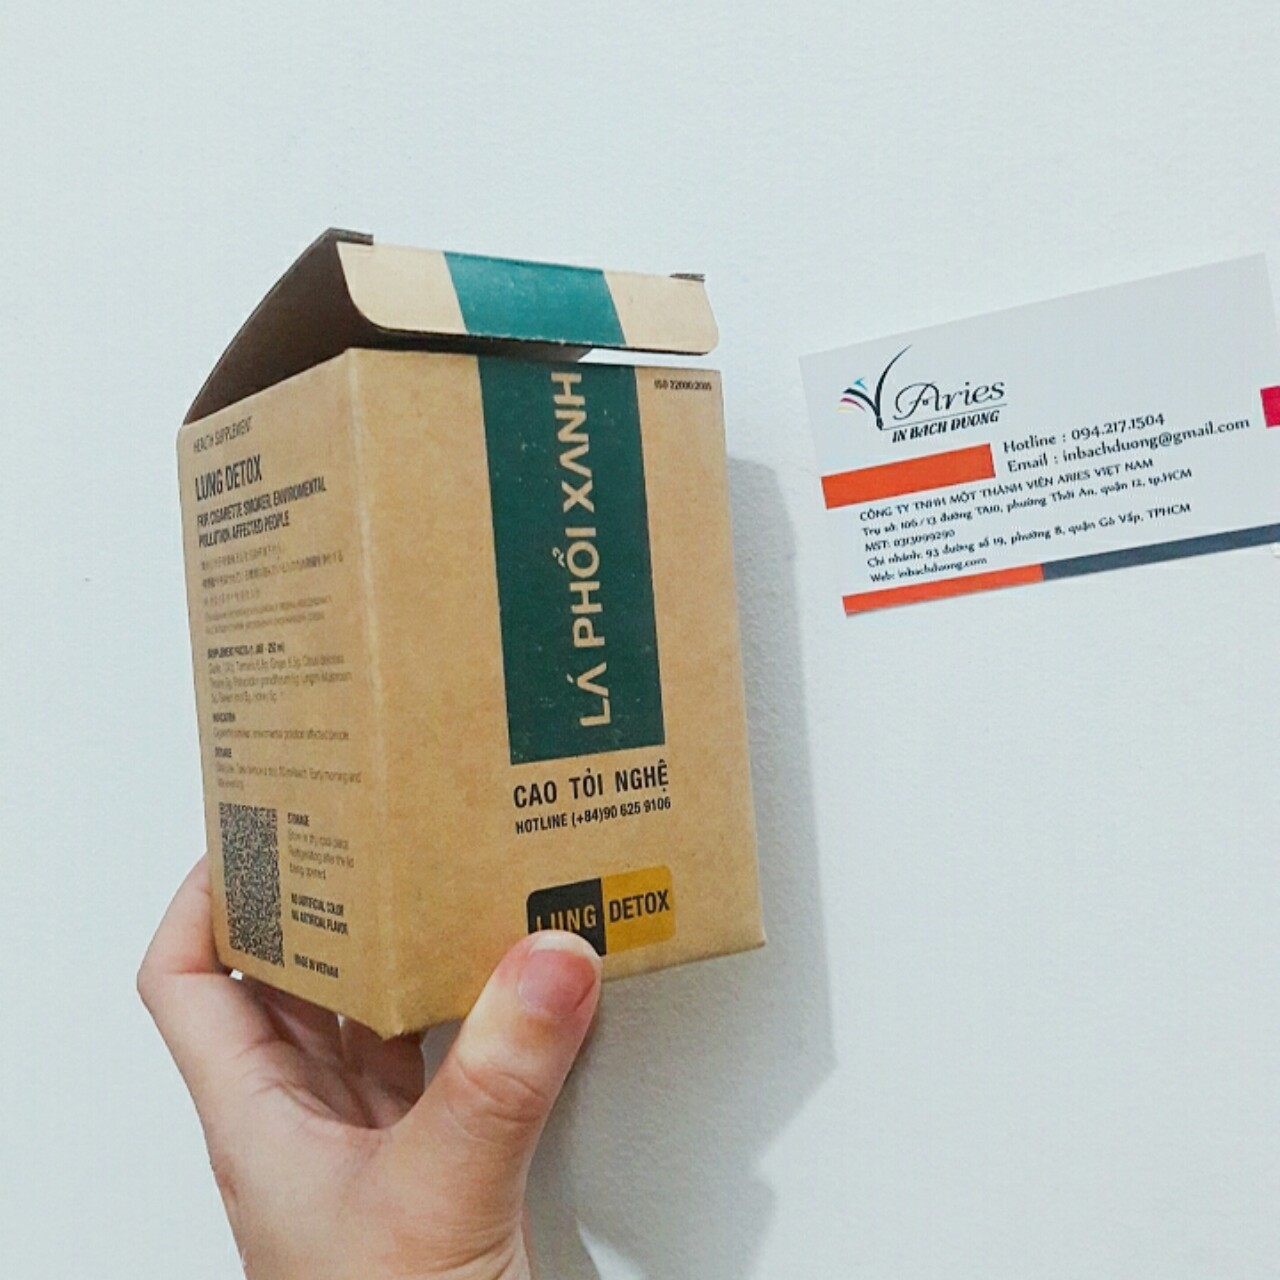 In hộp giấy carton nhỏ